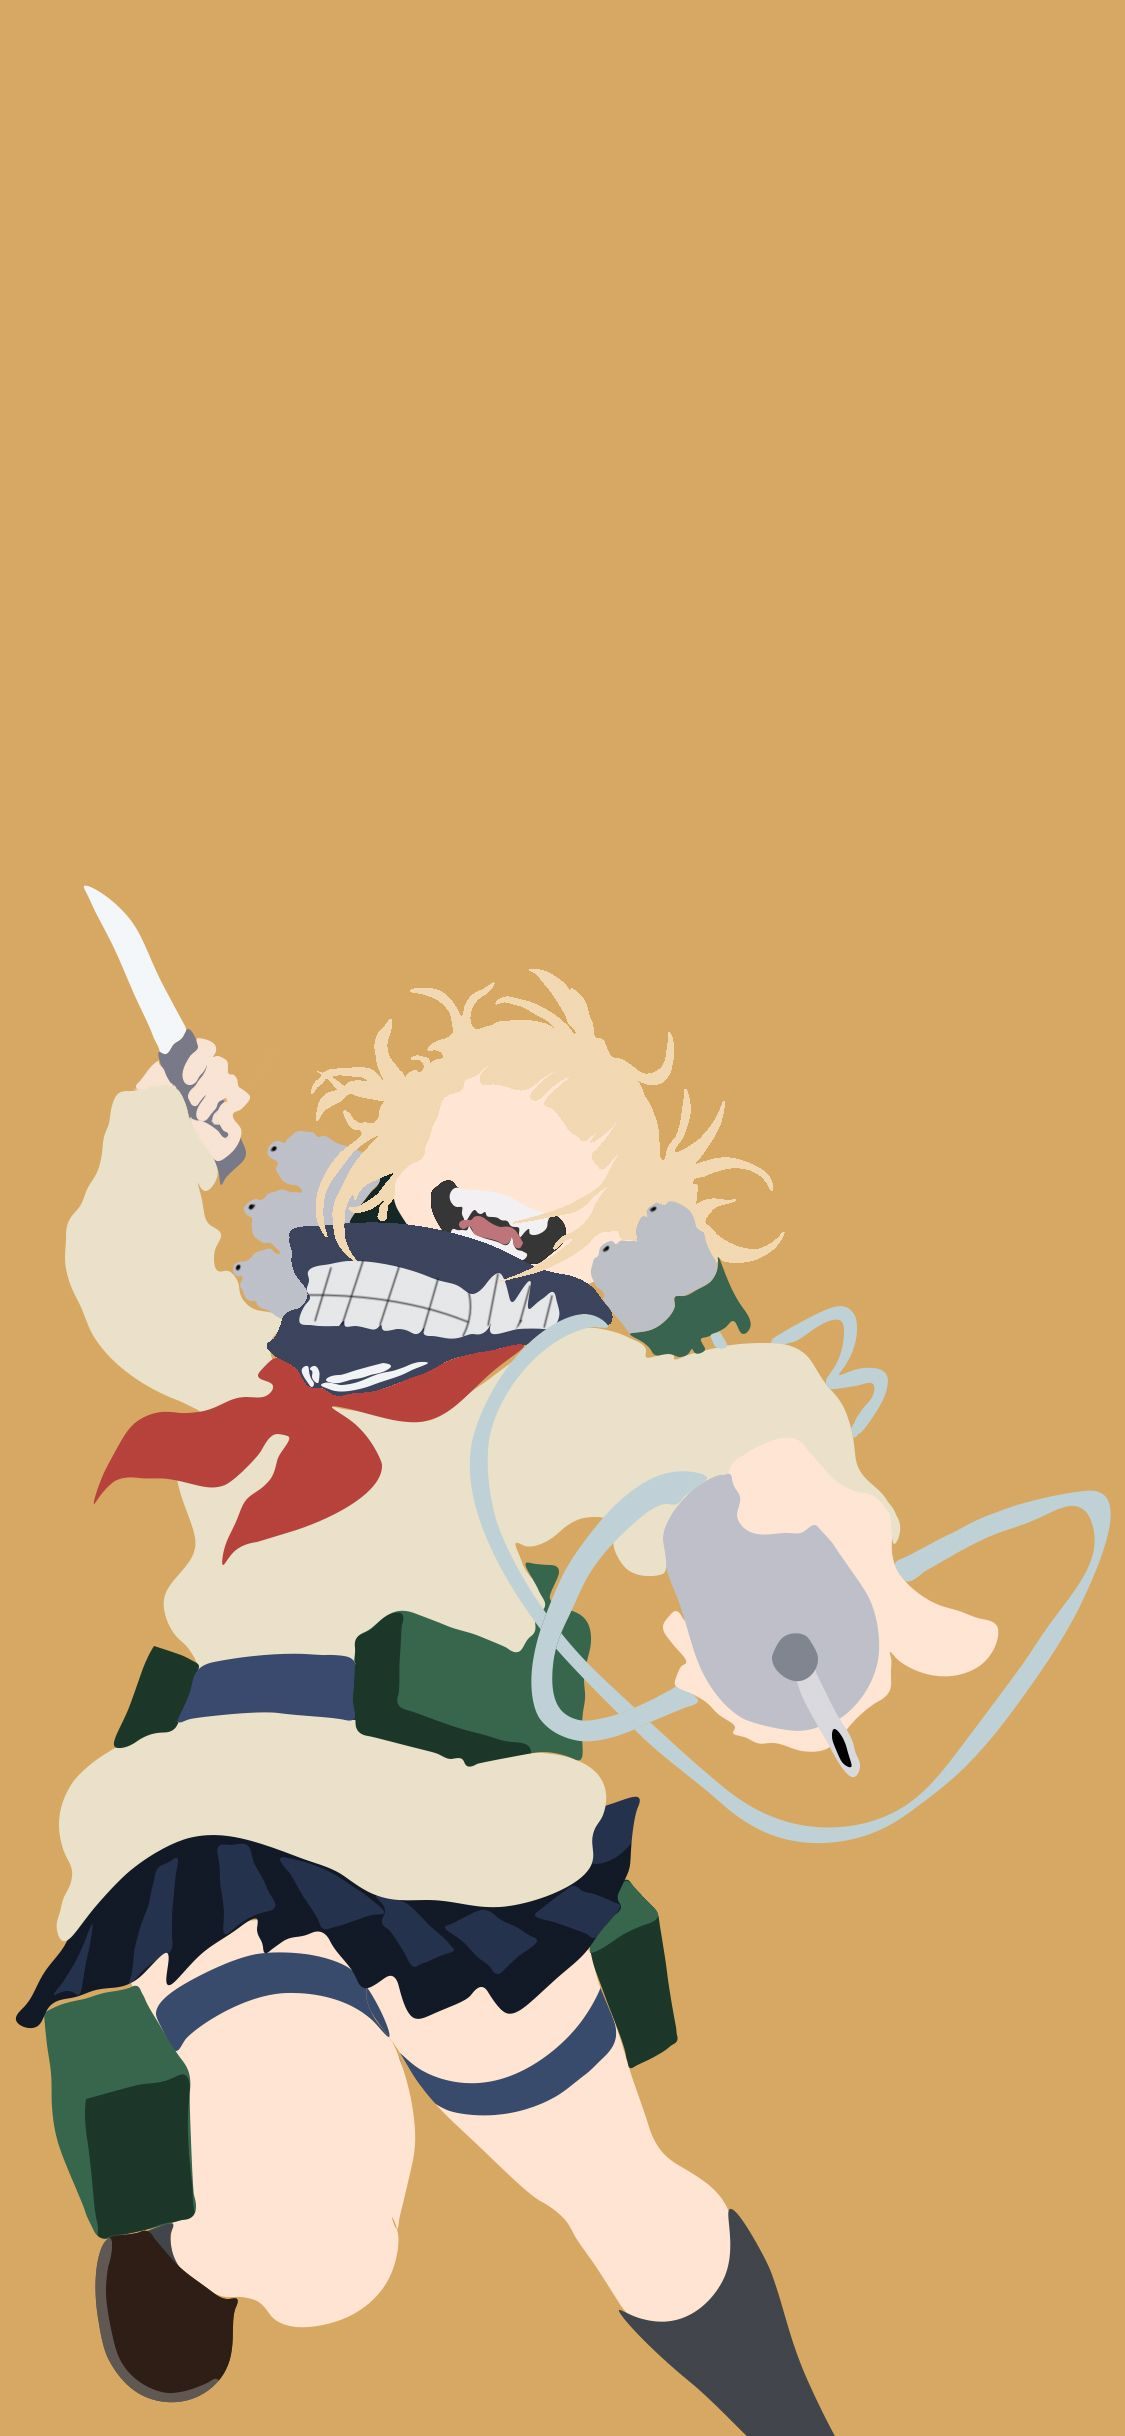 Toga Himiko Wallpaper Hero Wallpaper Cool Anime Wallpapers Cute Anime Character